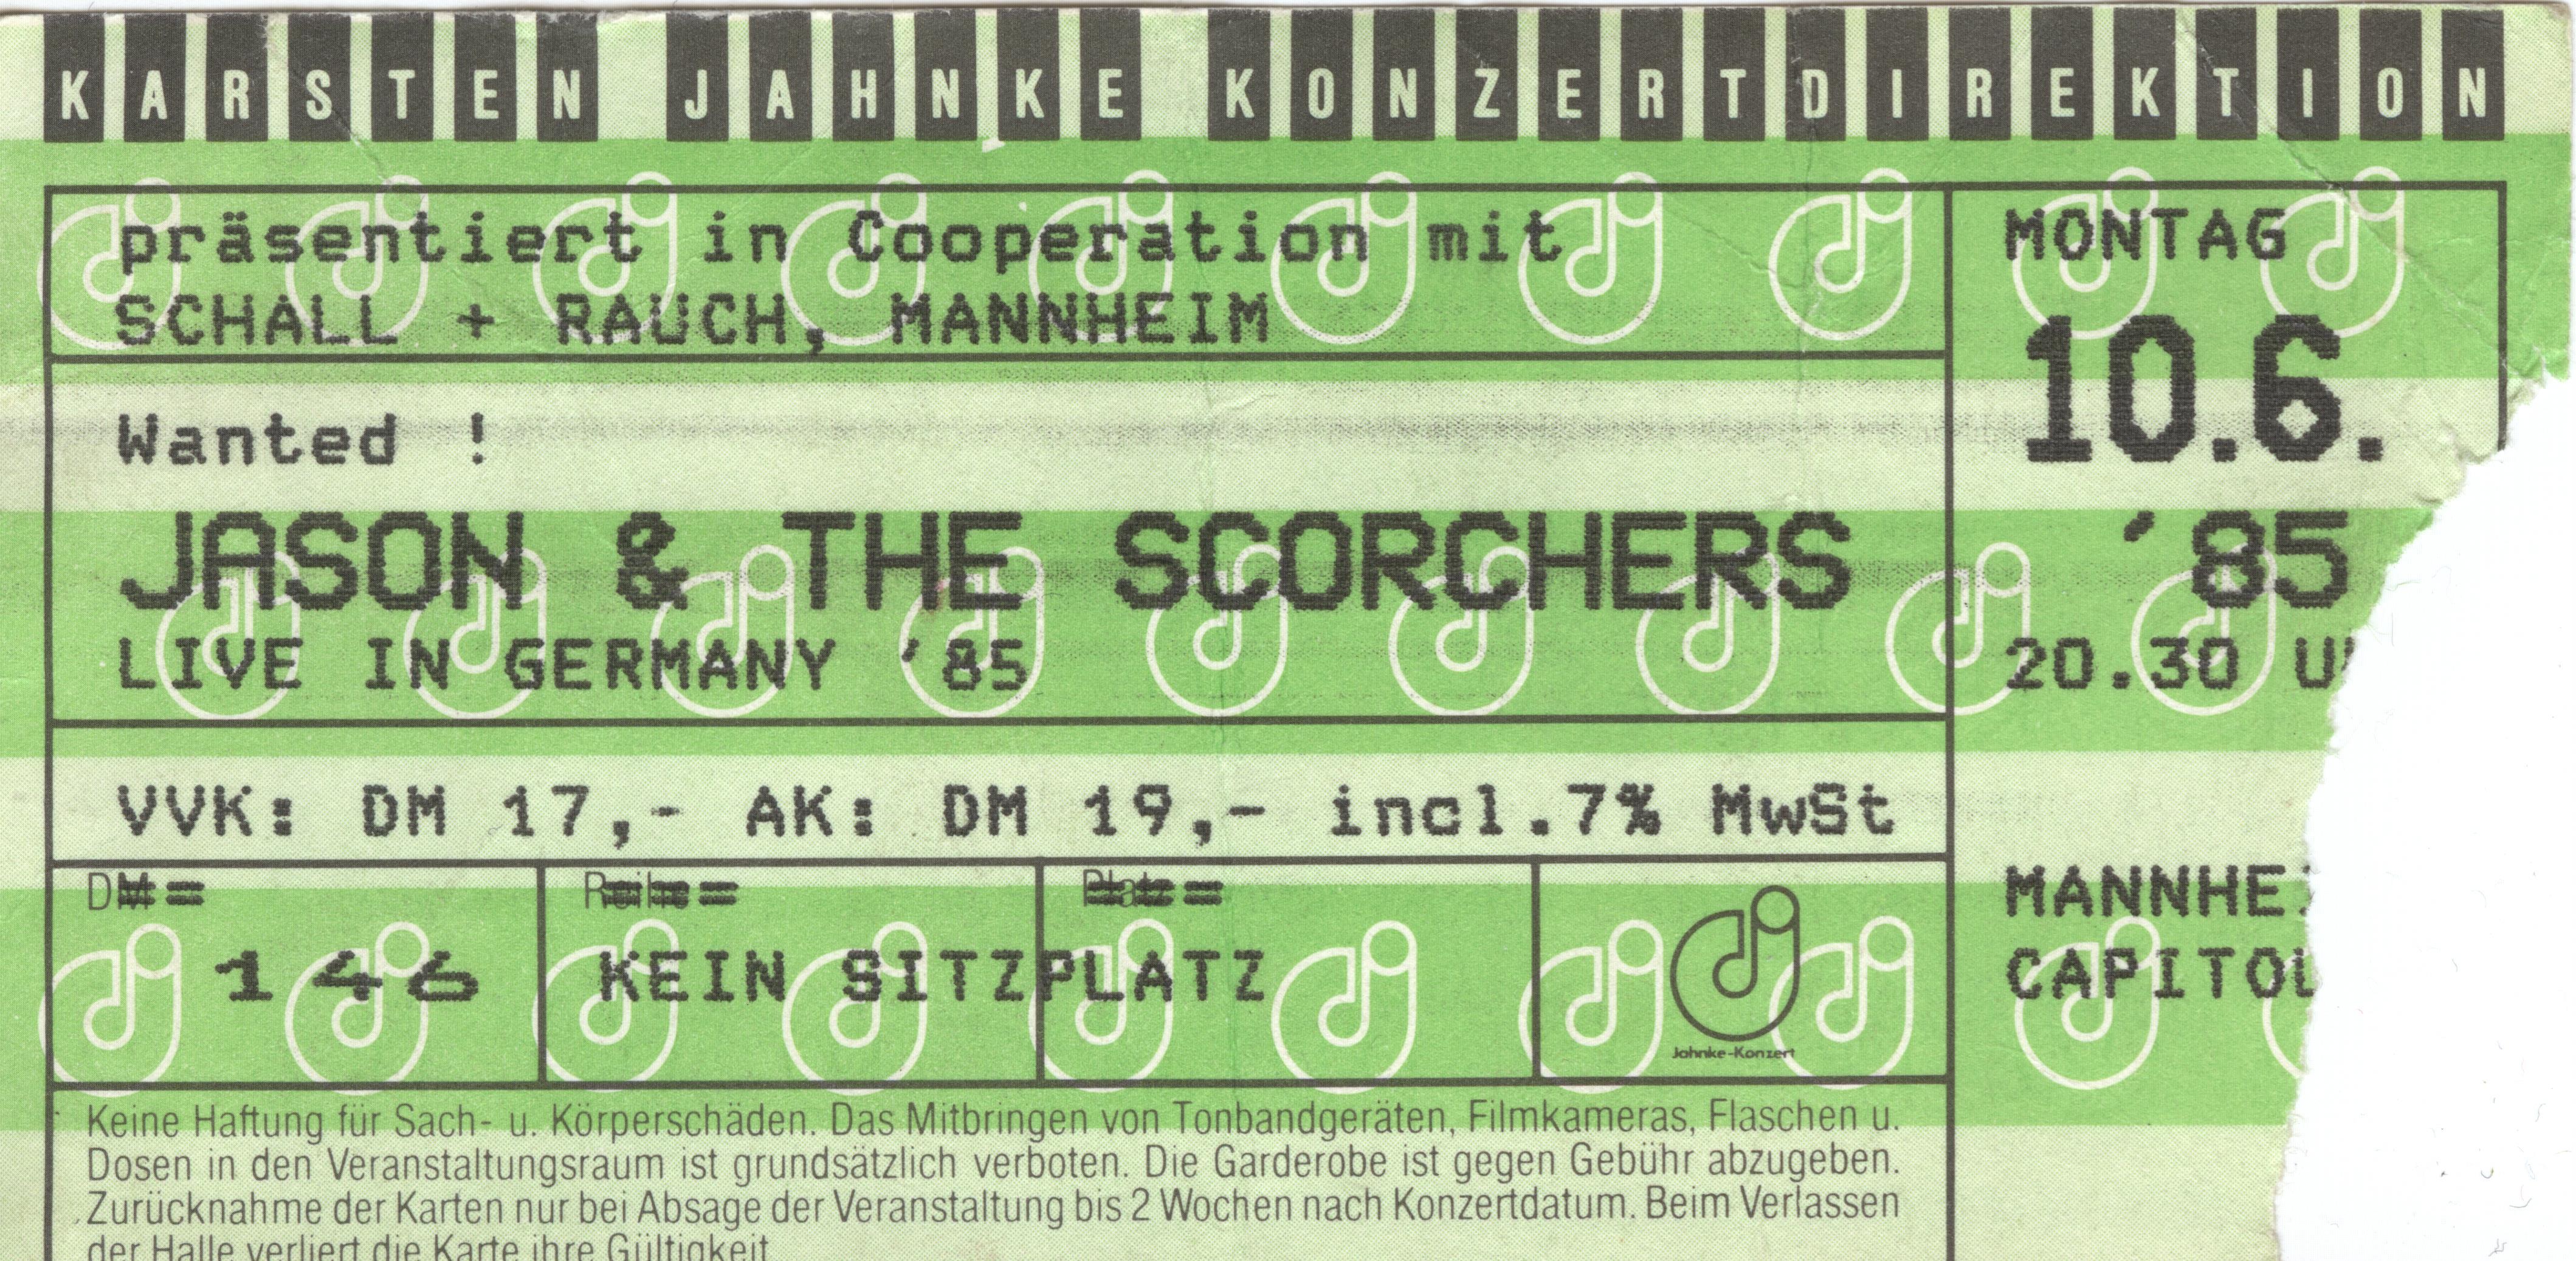 JasonAndTheScorchers1985-06-10CapitolMannheimGermany.jpg